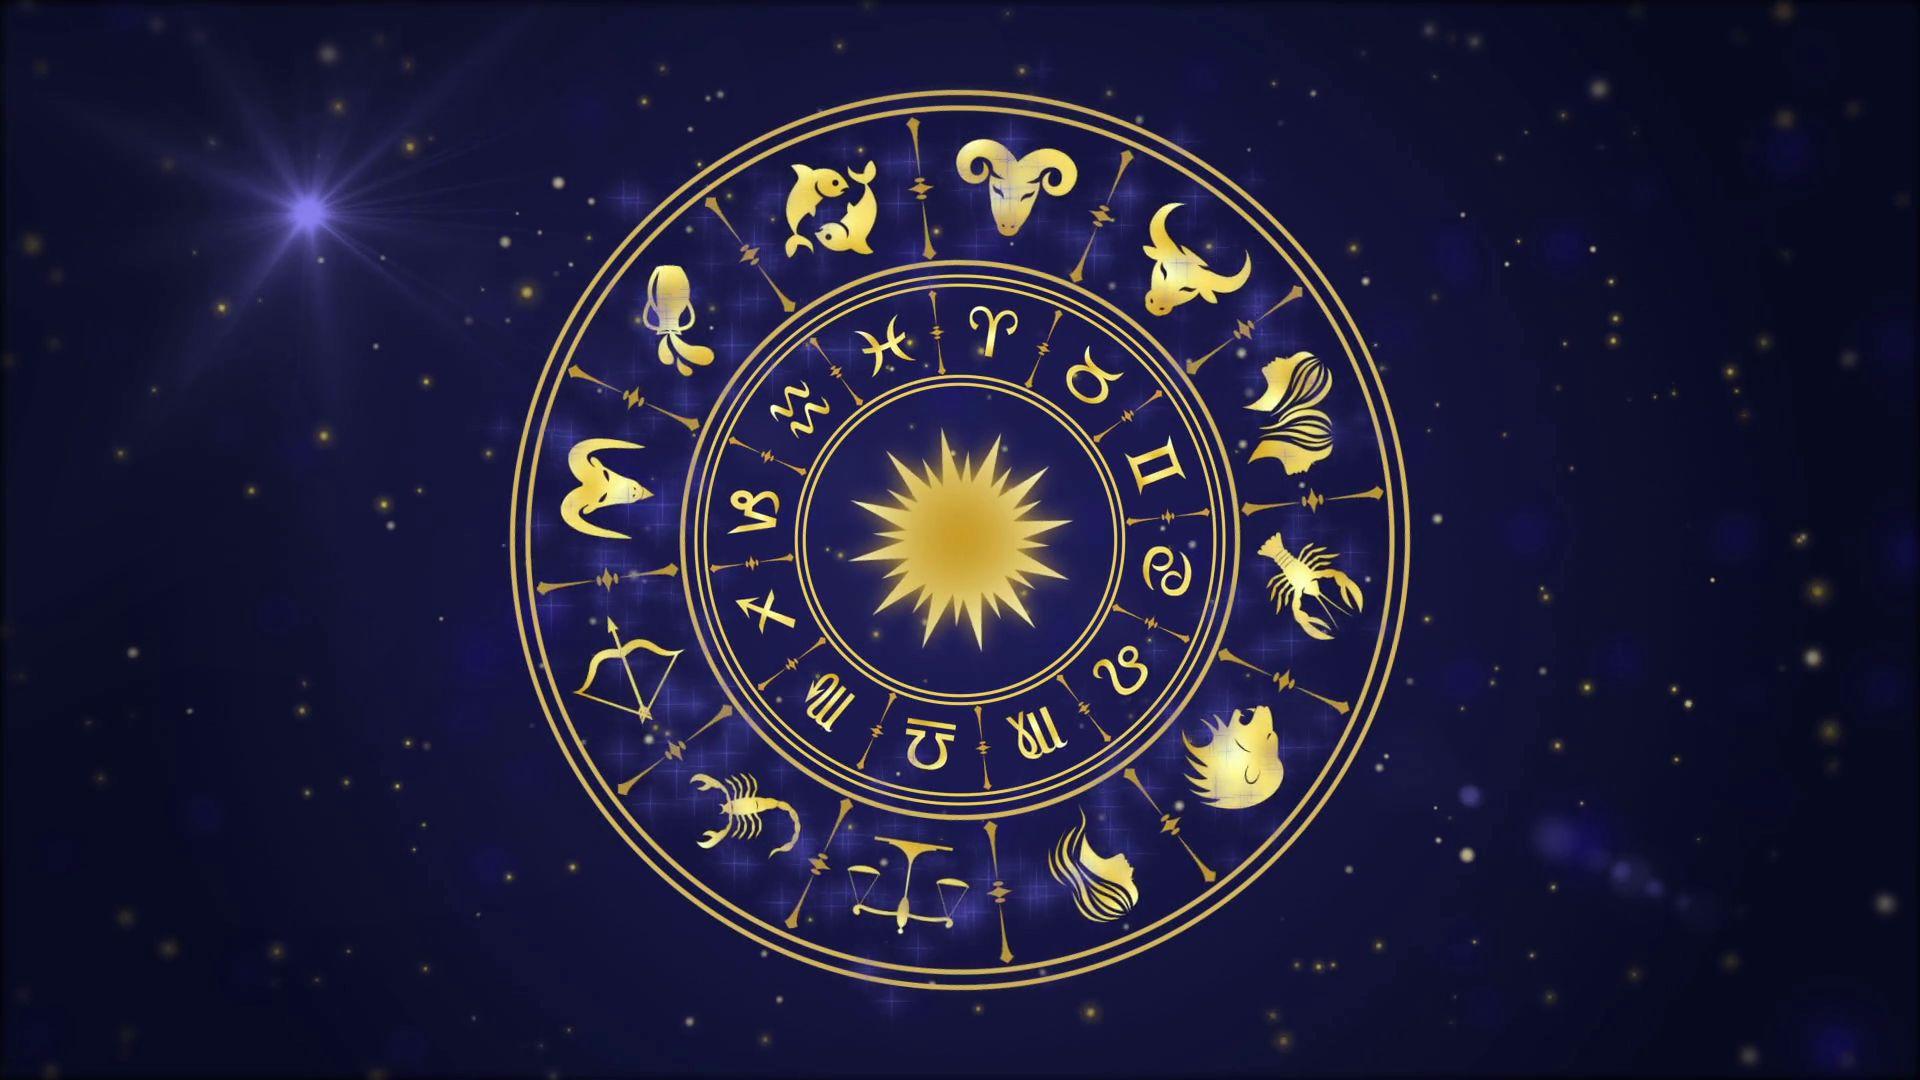 Ramalan Zodiak 24 Agustus: Taurus dan Gemini Harus Hemat, Virgo Tampak Mujur